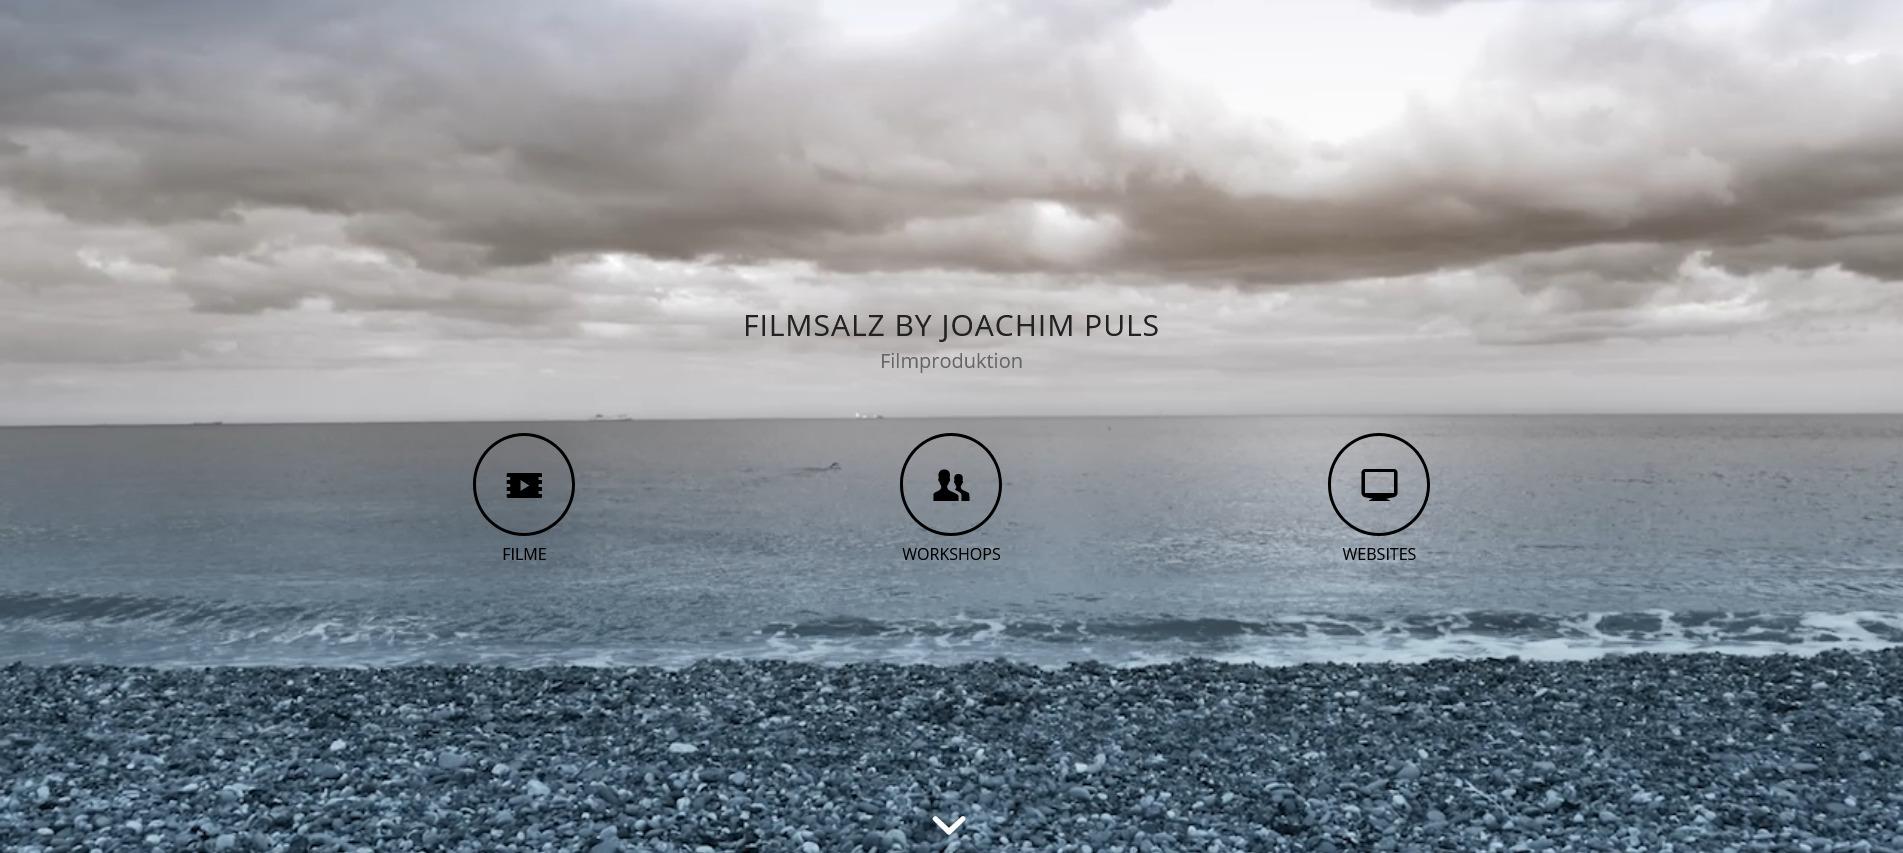 filmsalz by Joachim Puls - Startseite